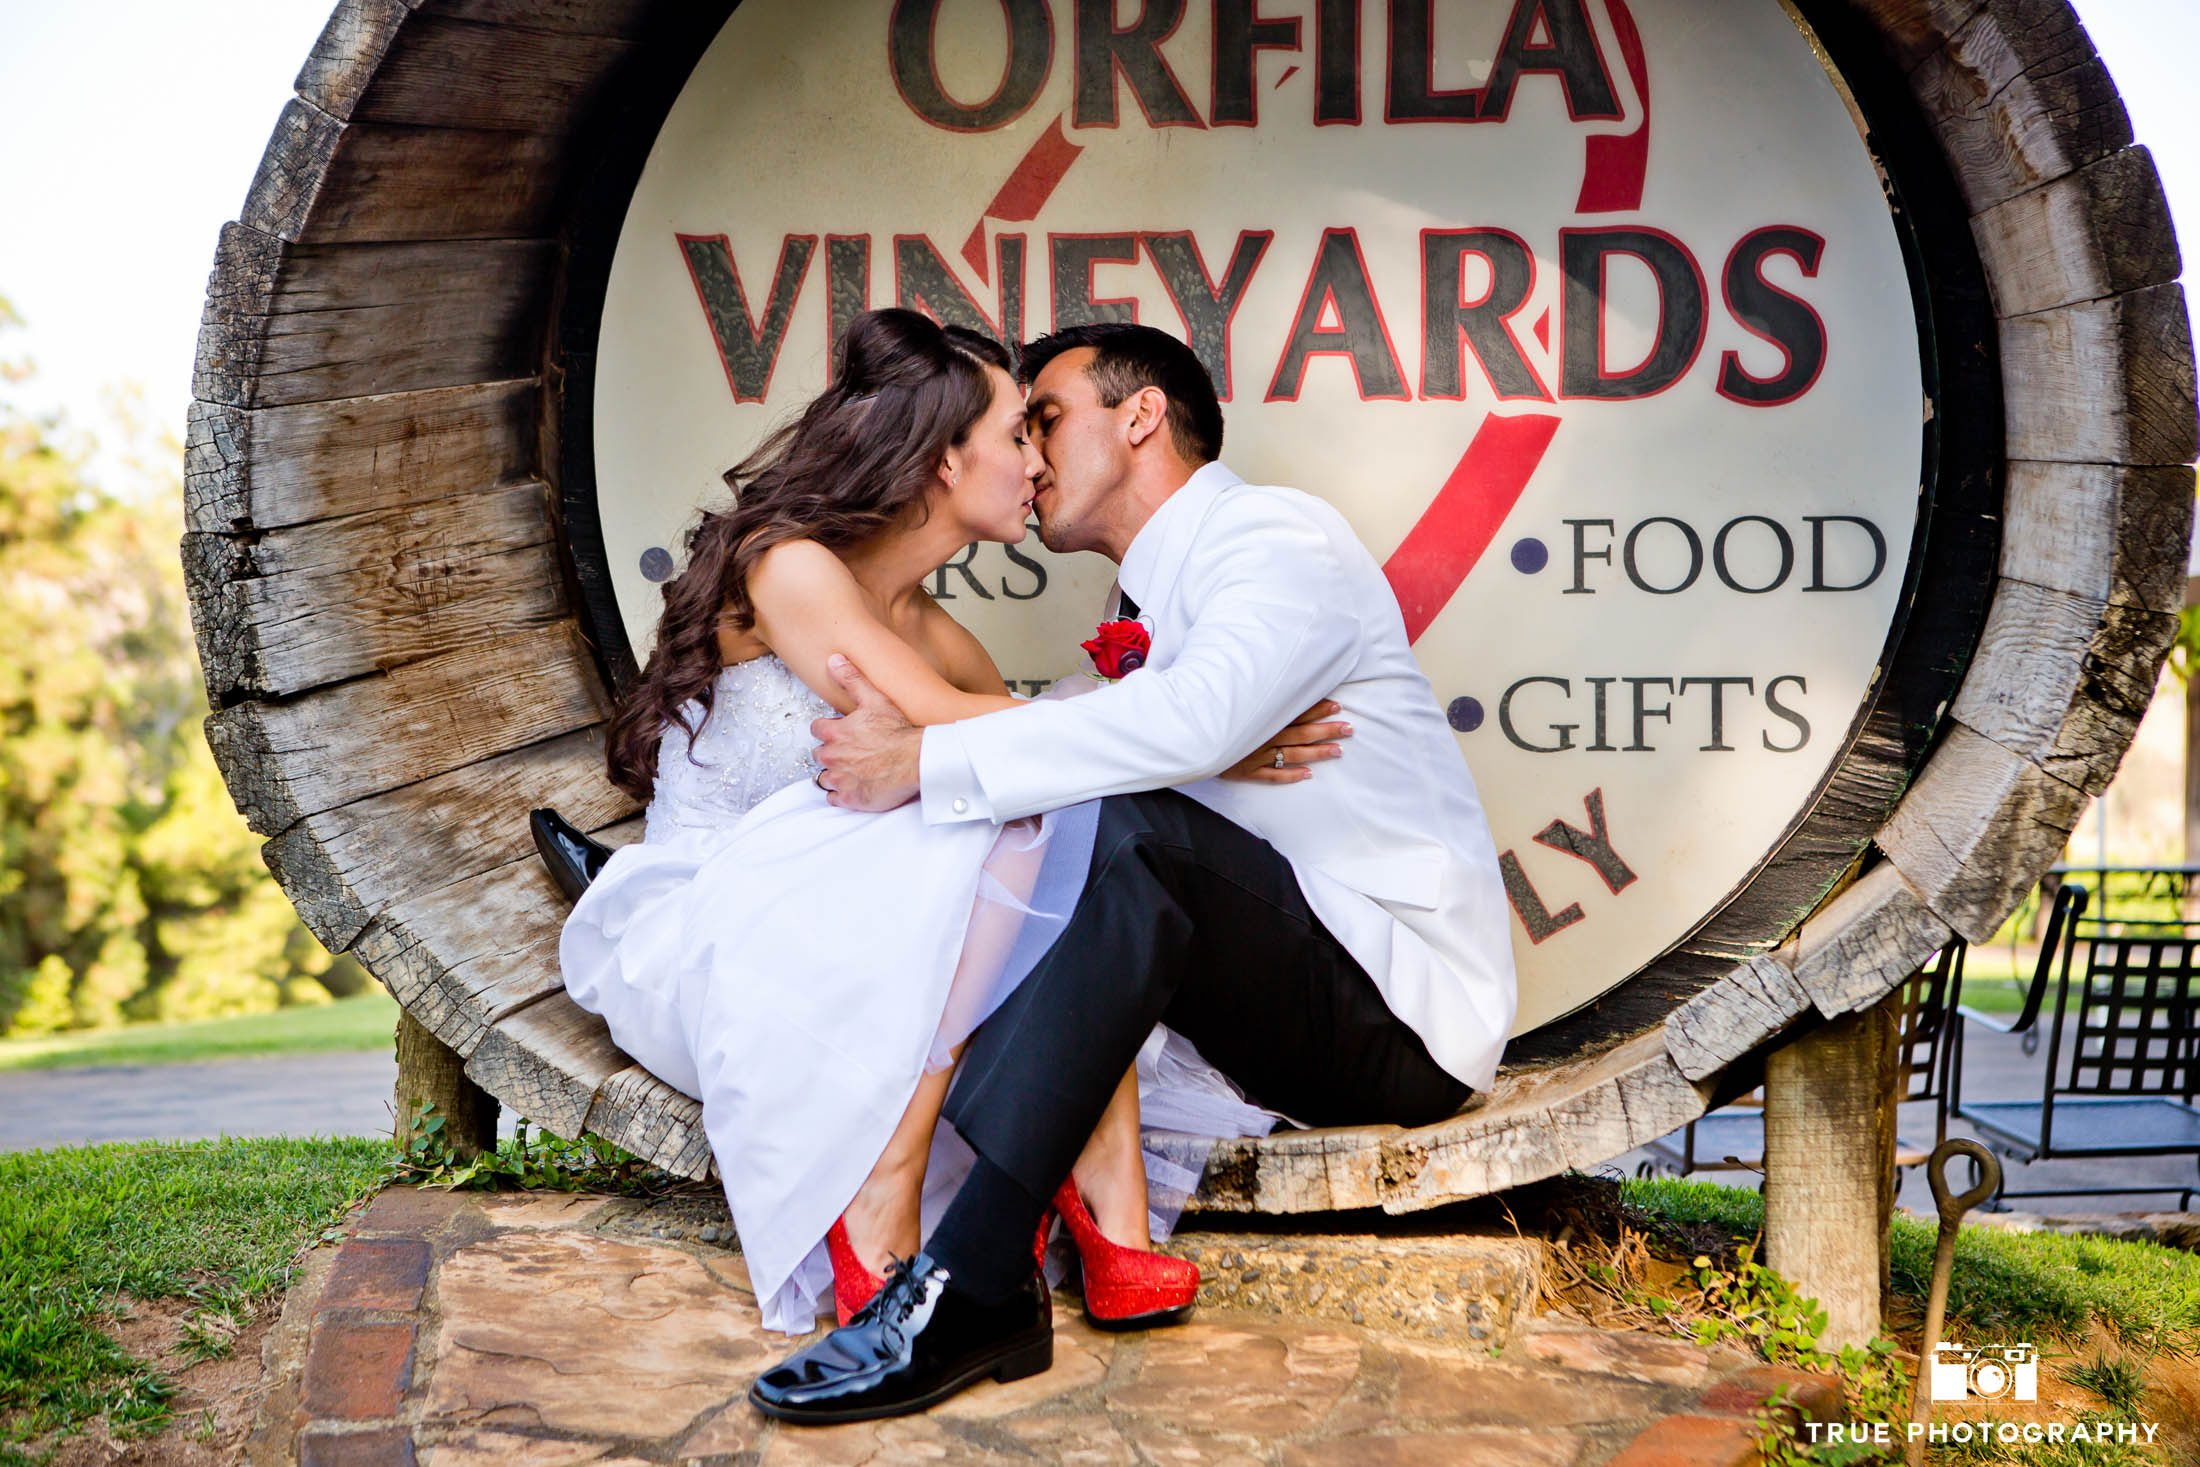 Couple kiss in oversized wine barrel